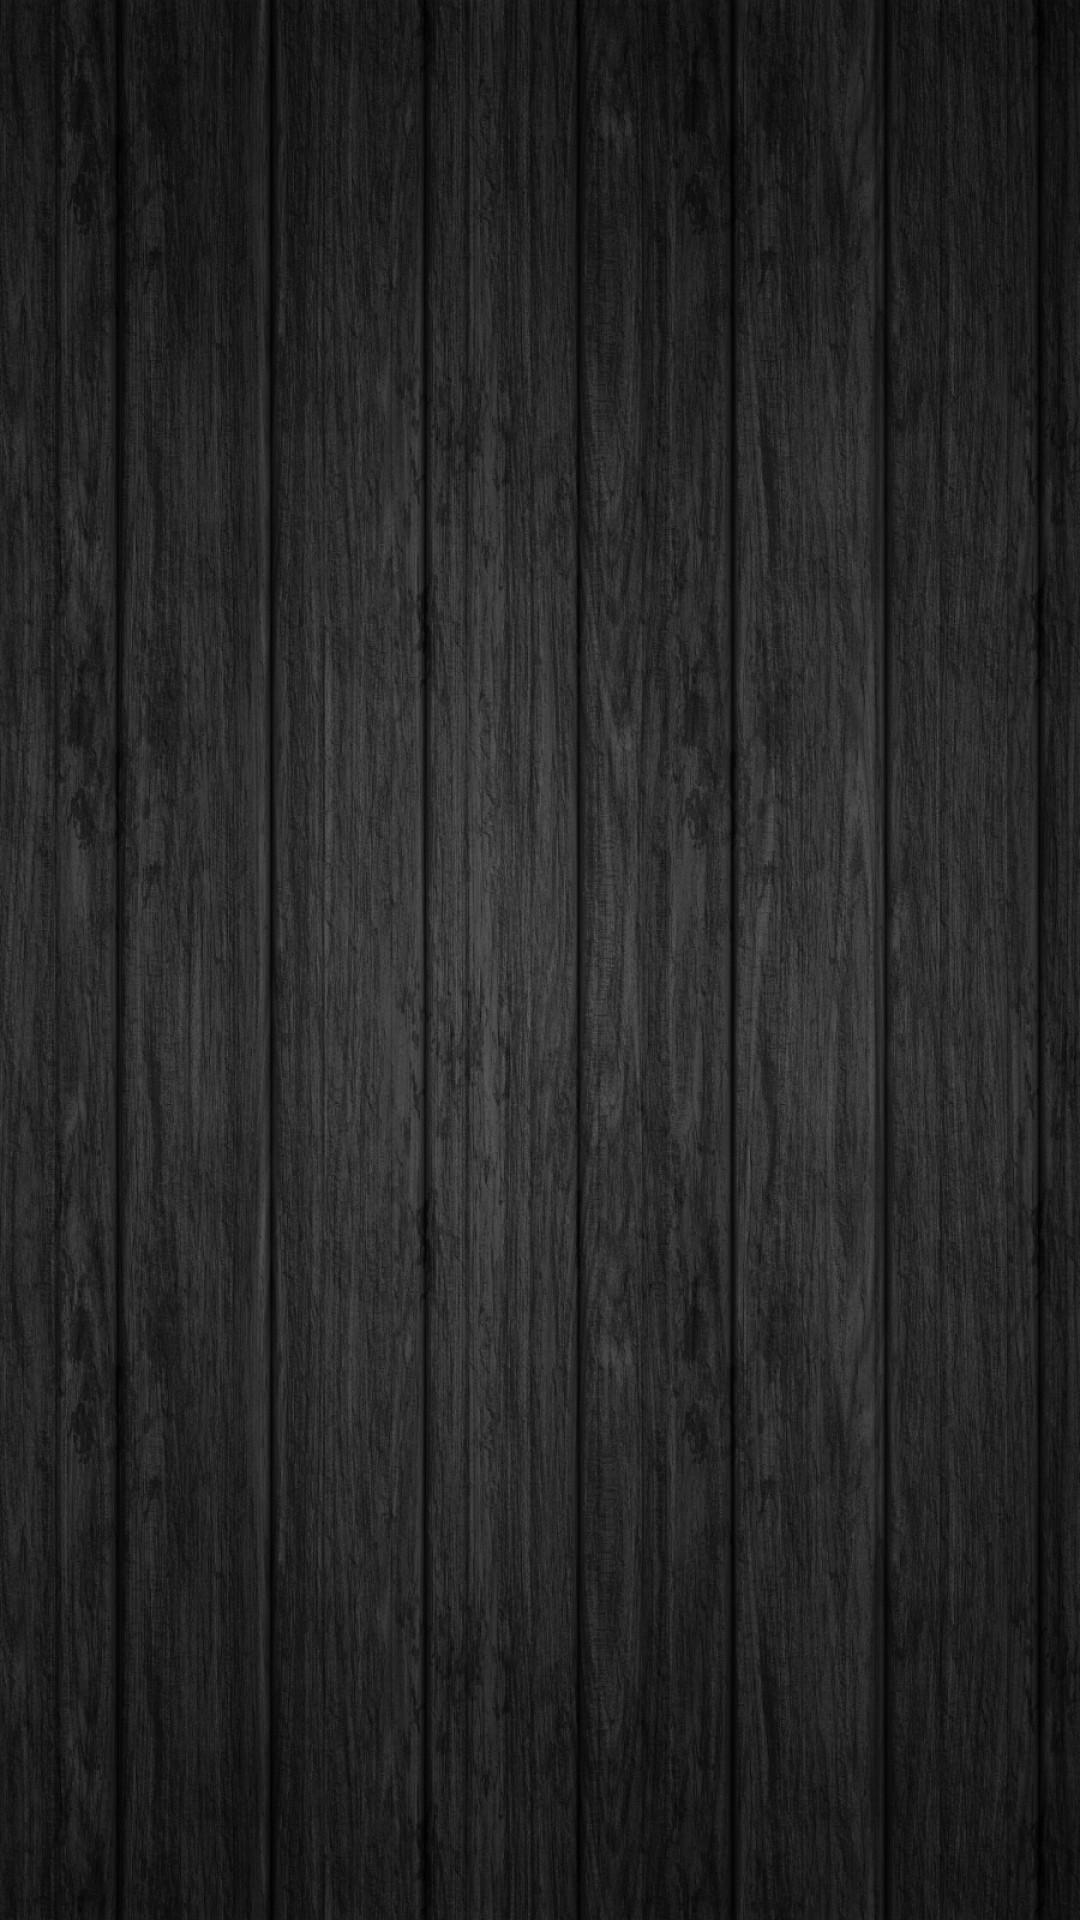 Free Black Wood phone wallpaper by josecastaneda